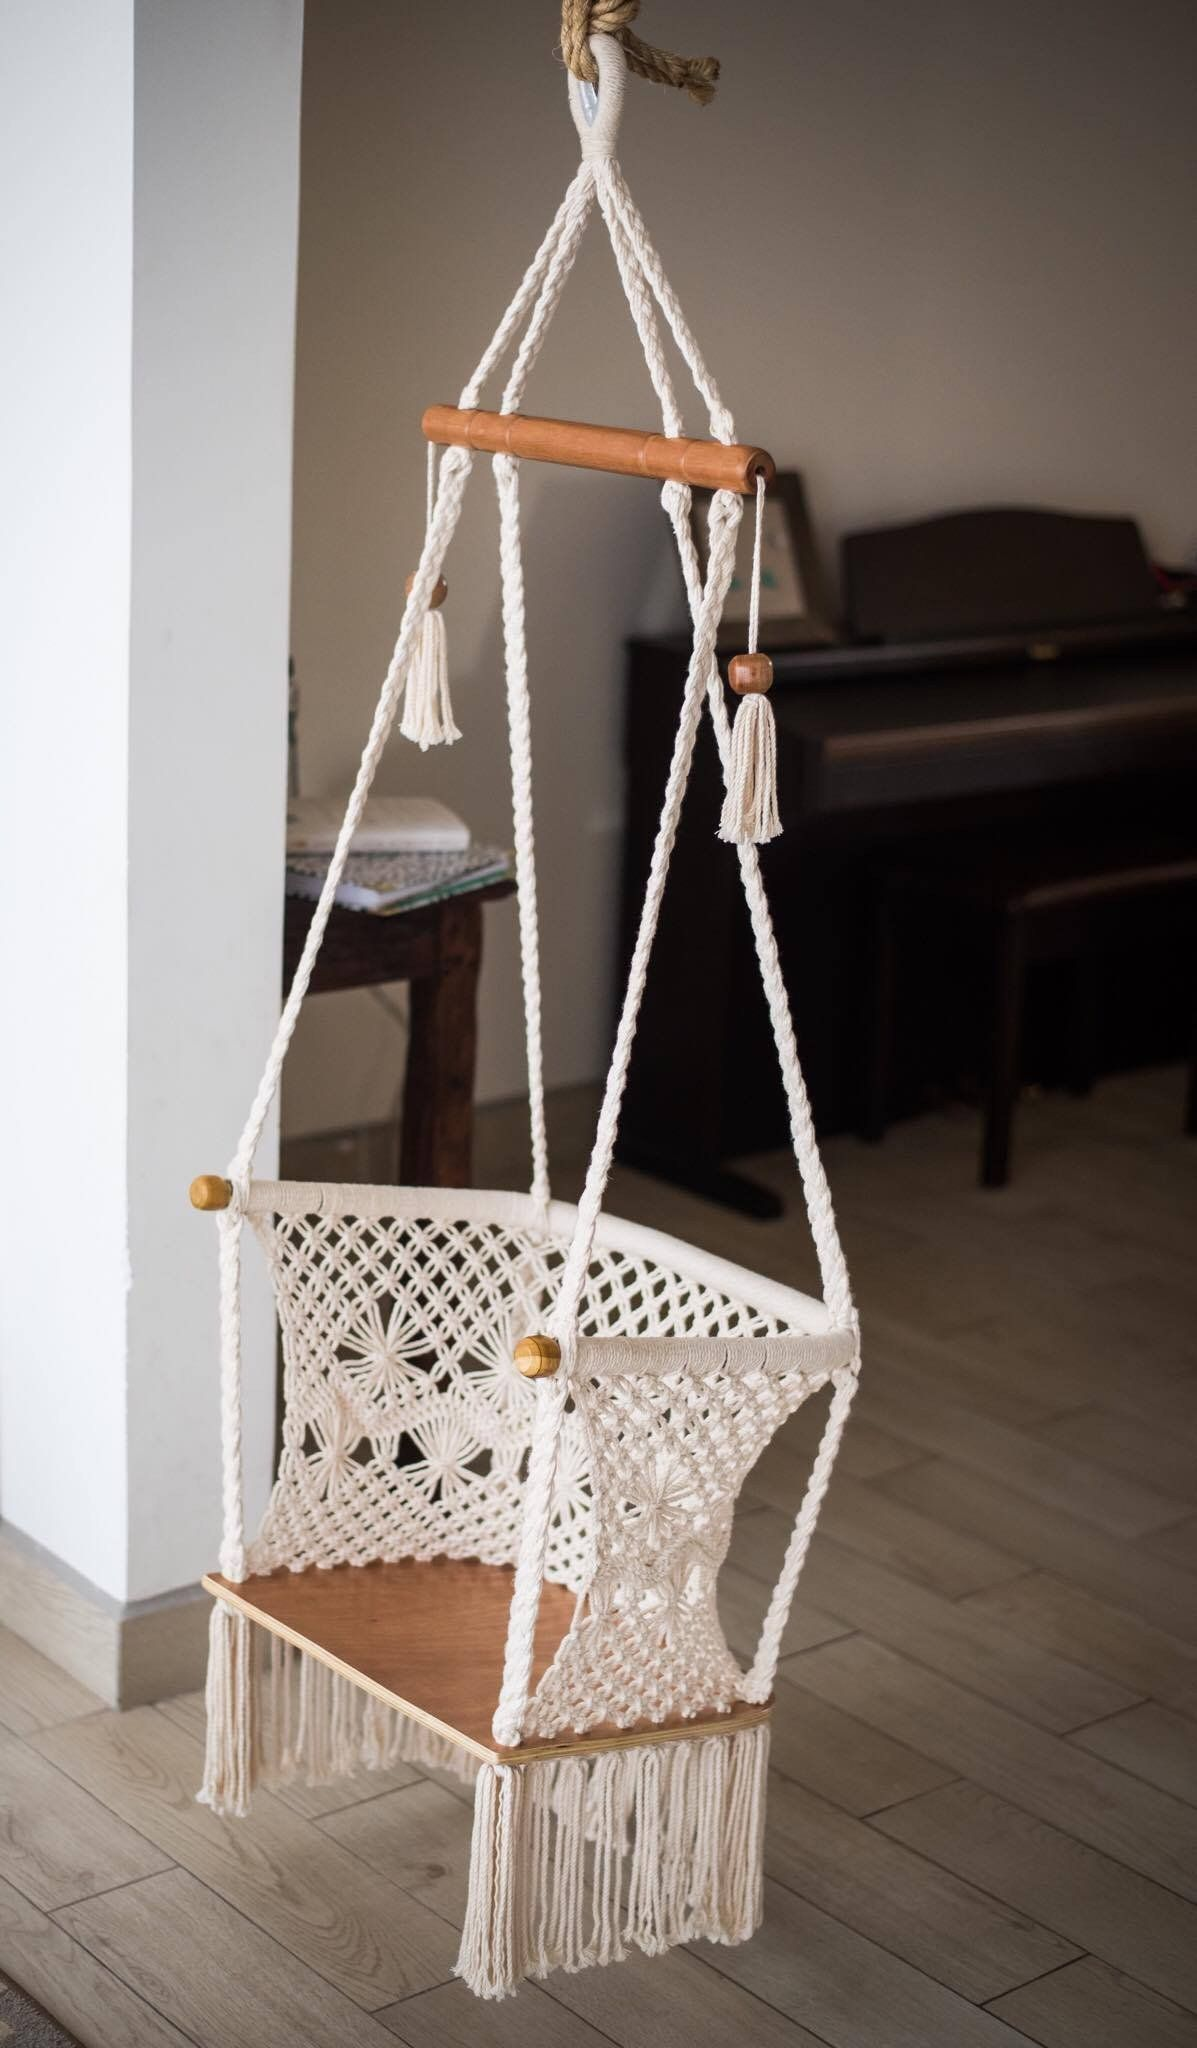 Macrame Hammock Swing Chair With Wood Bottom Handmade In